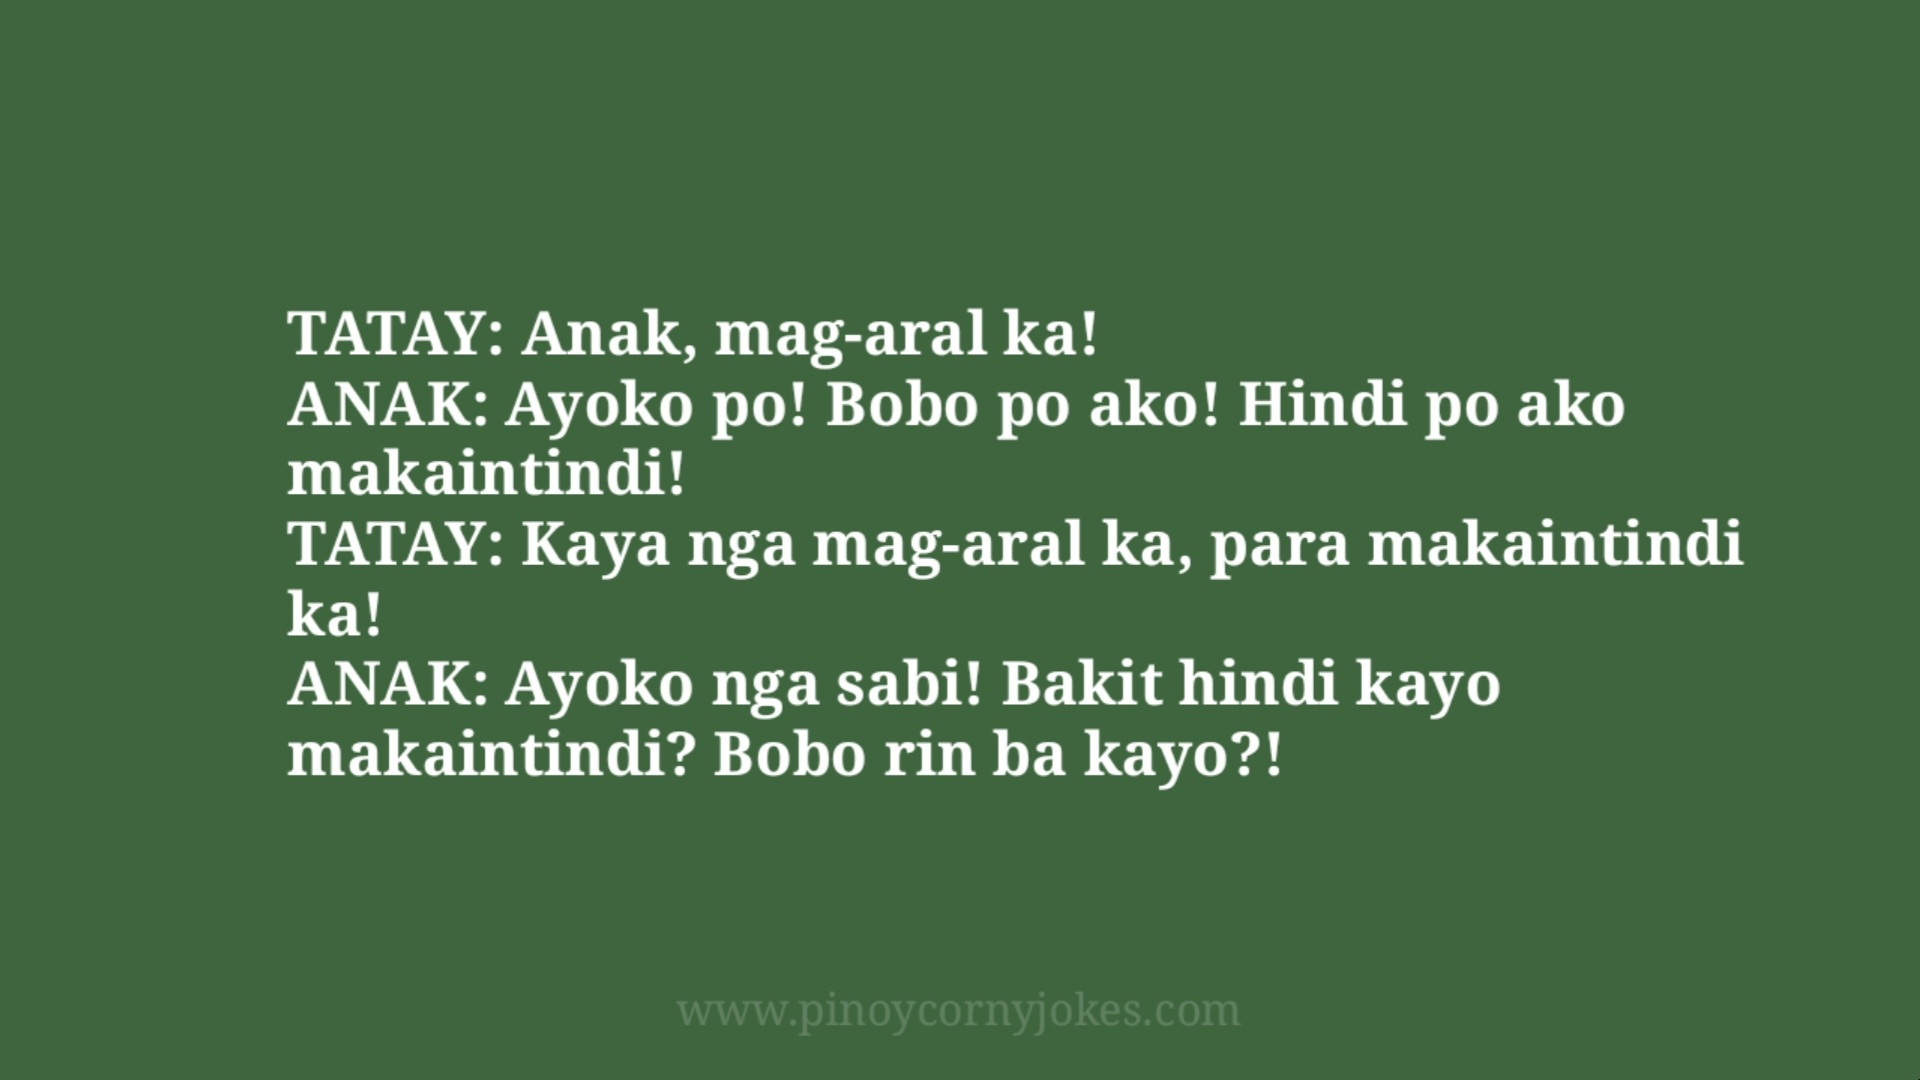 mag aral ka pinoy corny jokes school